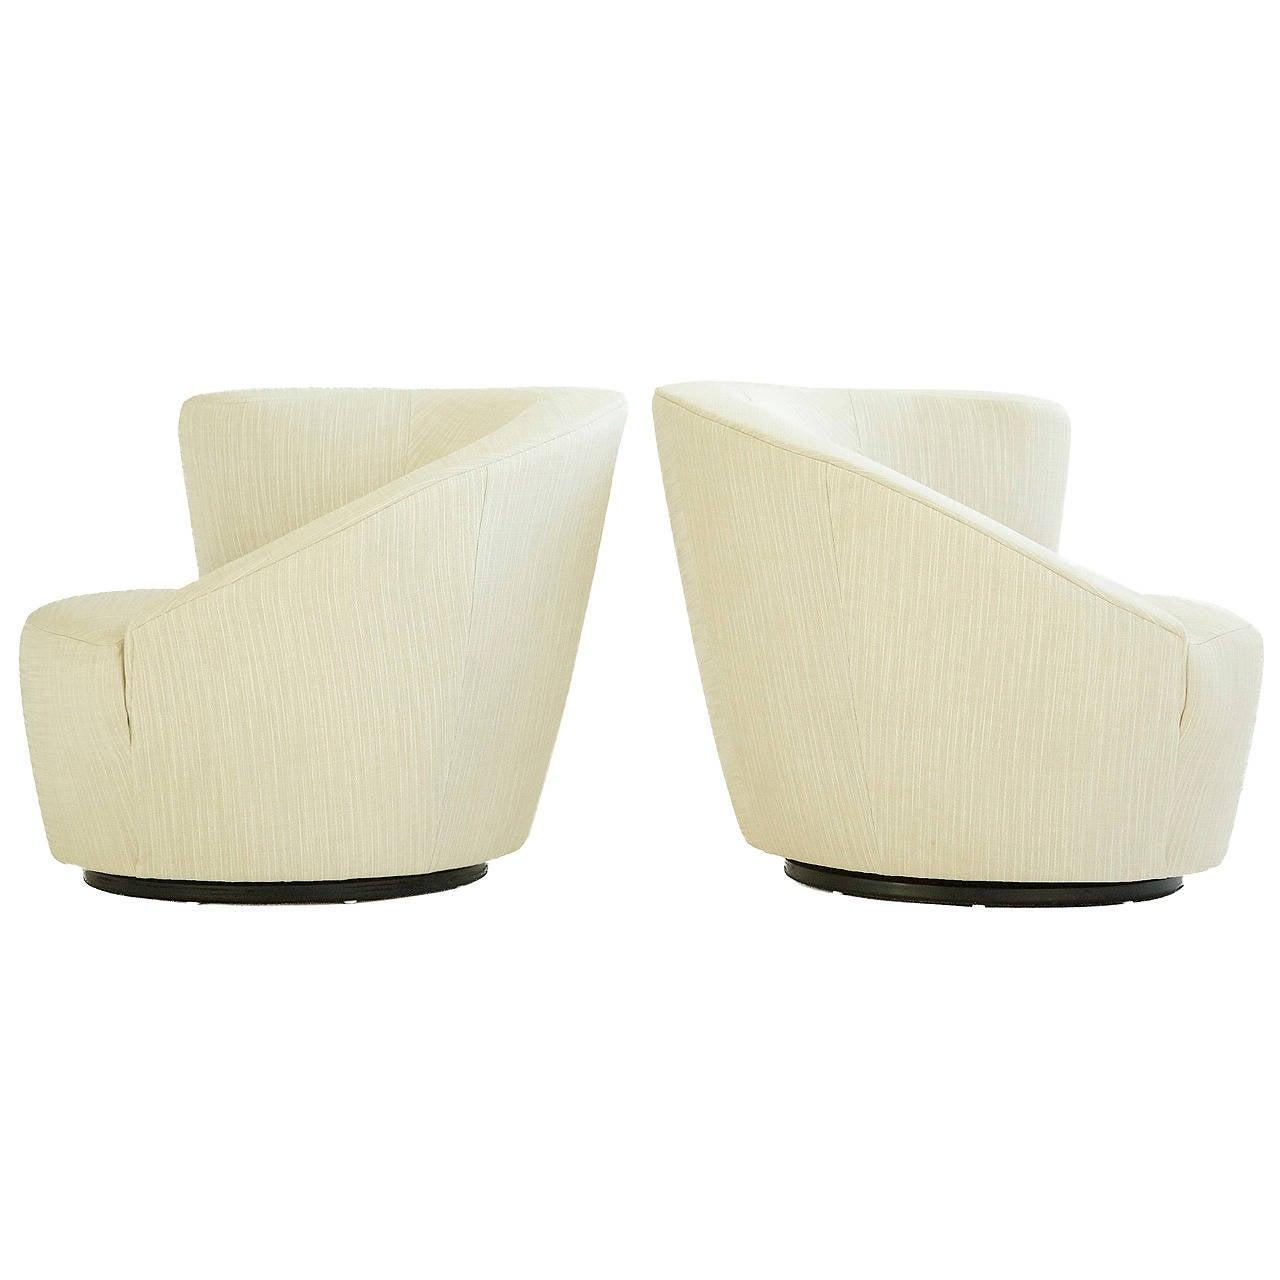 Vladimir Kagan Swivel Lounge Chairs For Sale